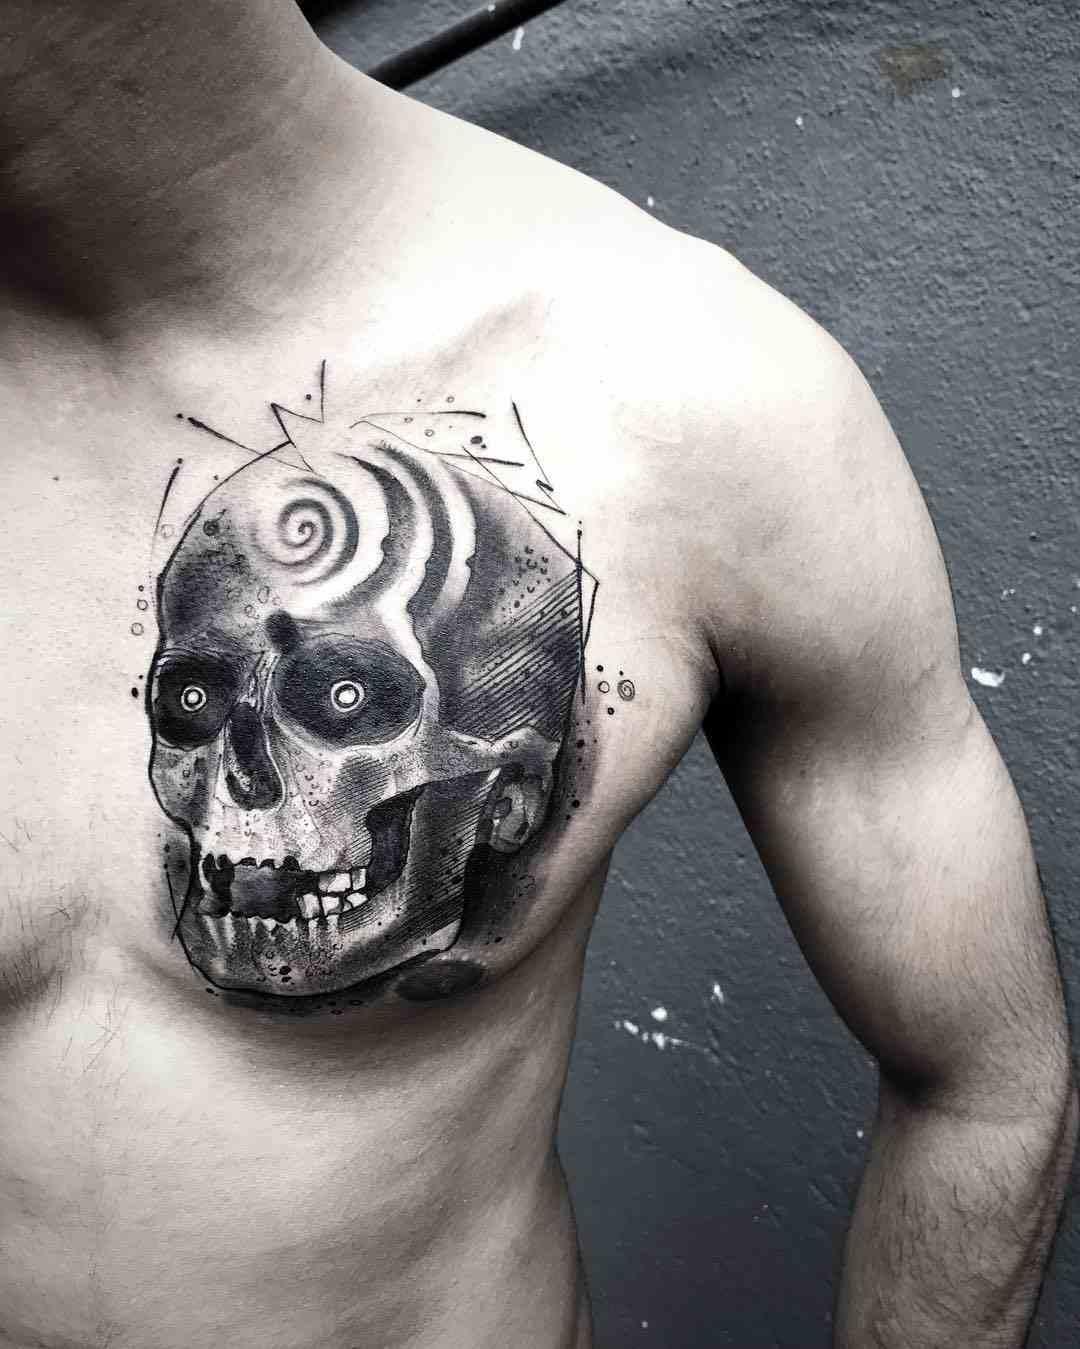 sculp-tattoos-banglore-chest-skull